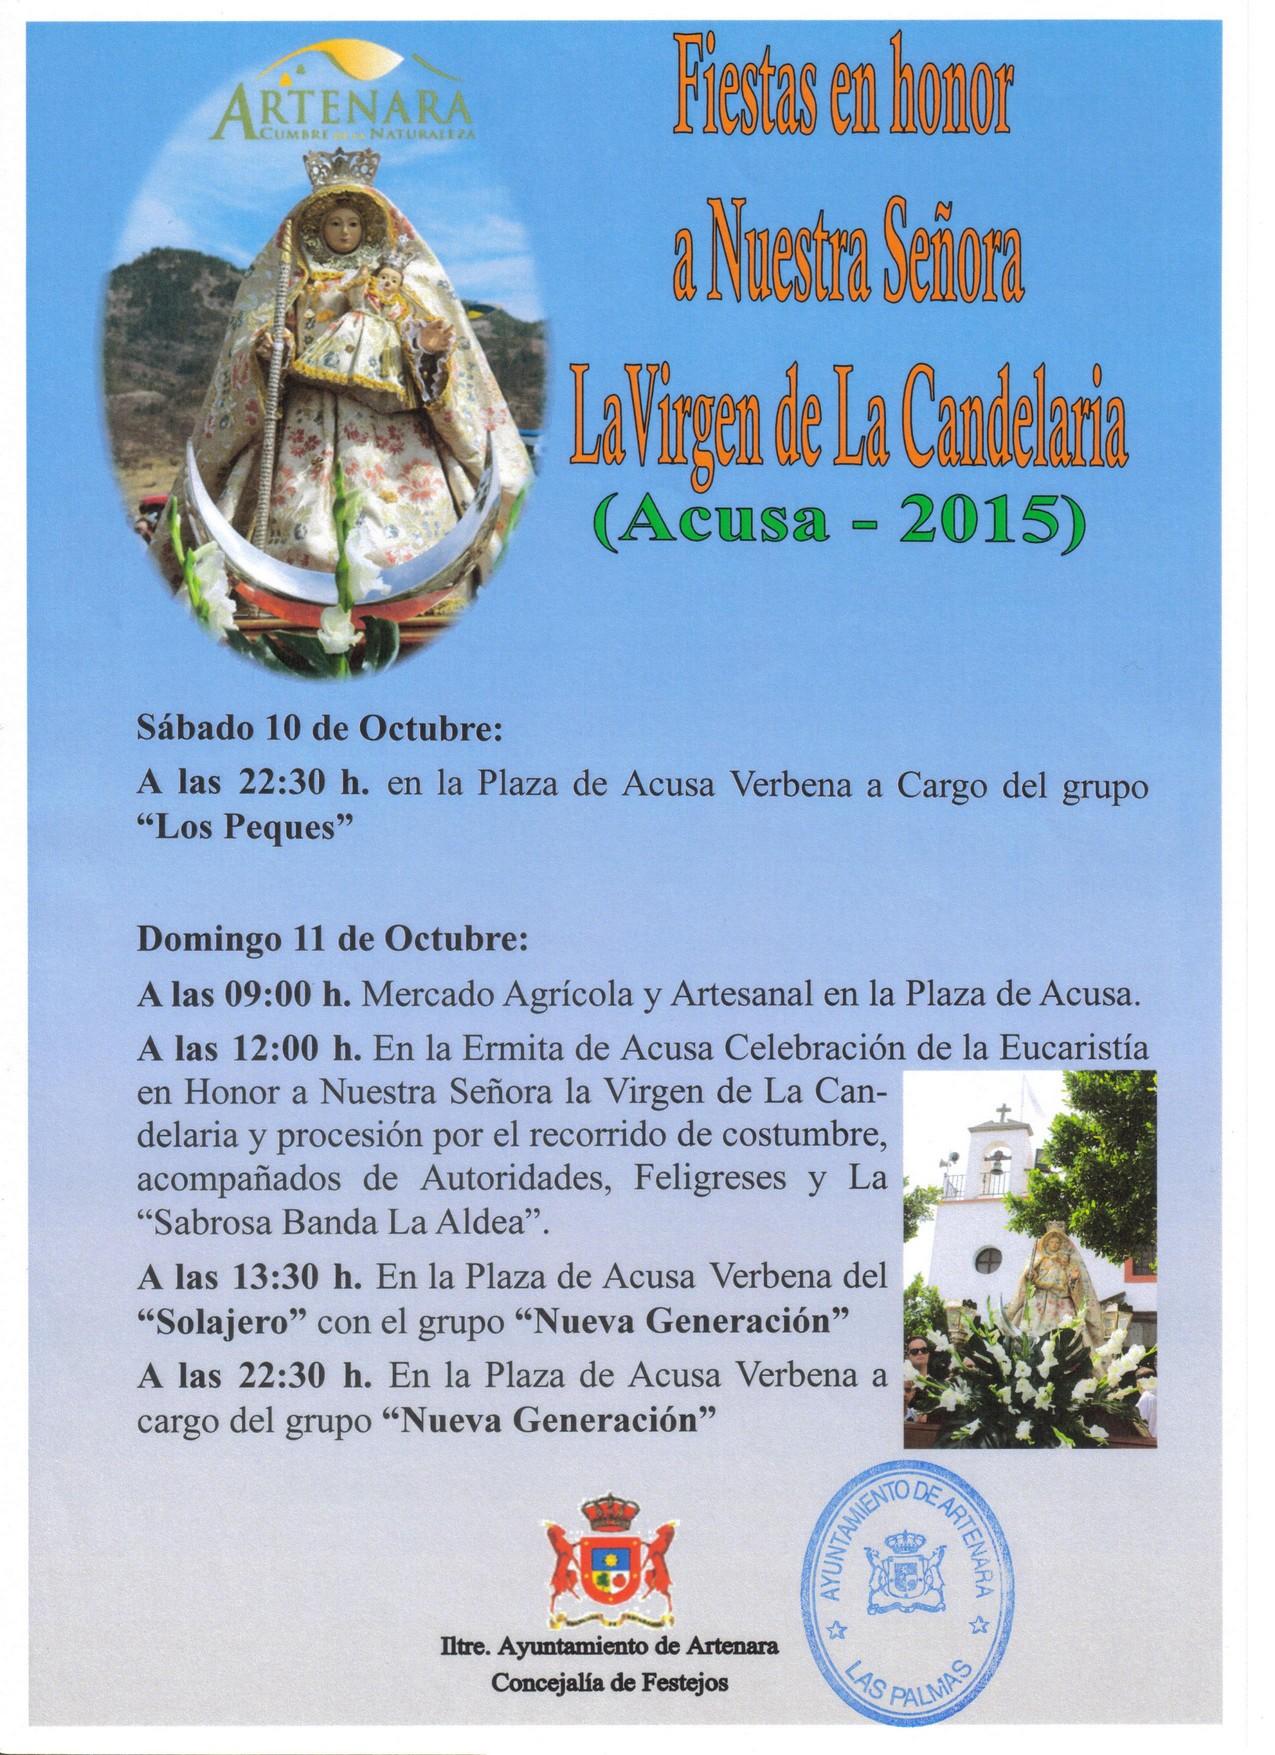 Cartel Fiestas Artenara 2015